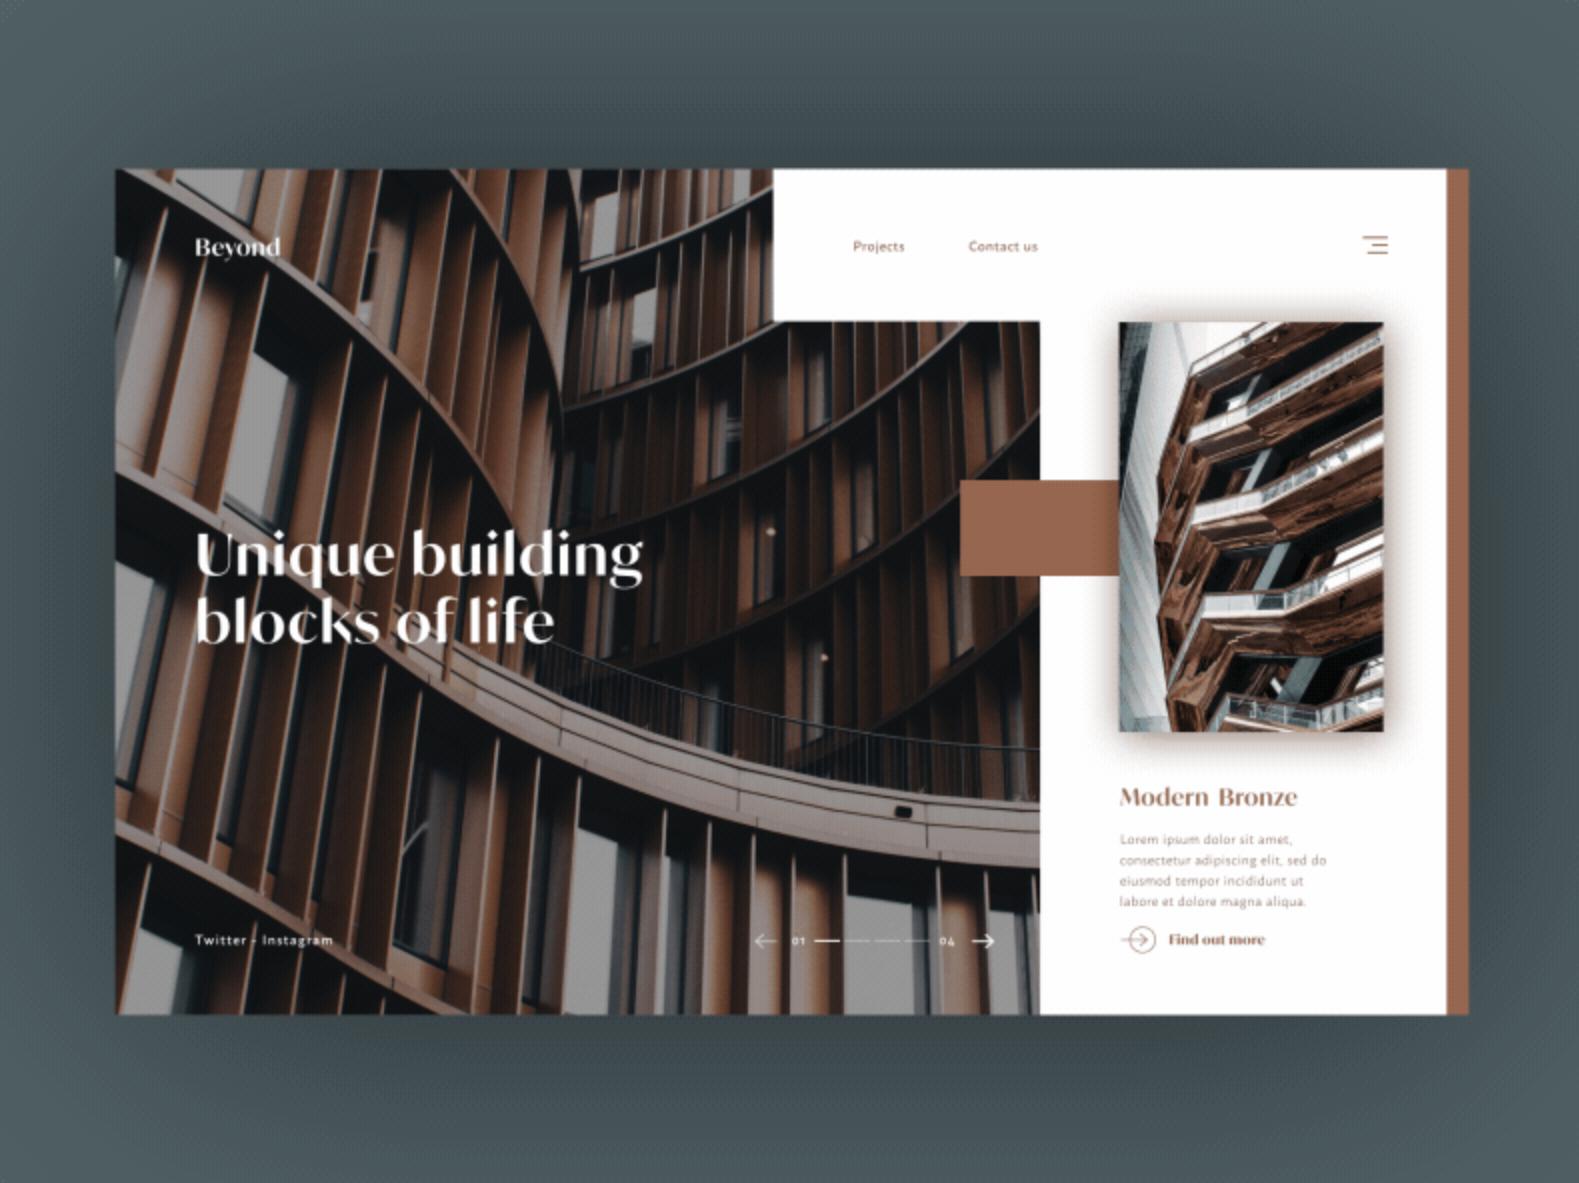 Example of using brown in web design (source: Daniel Hurst)